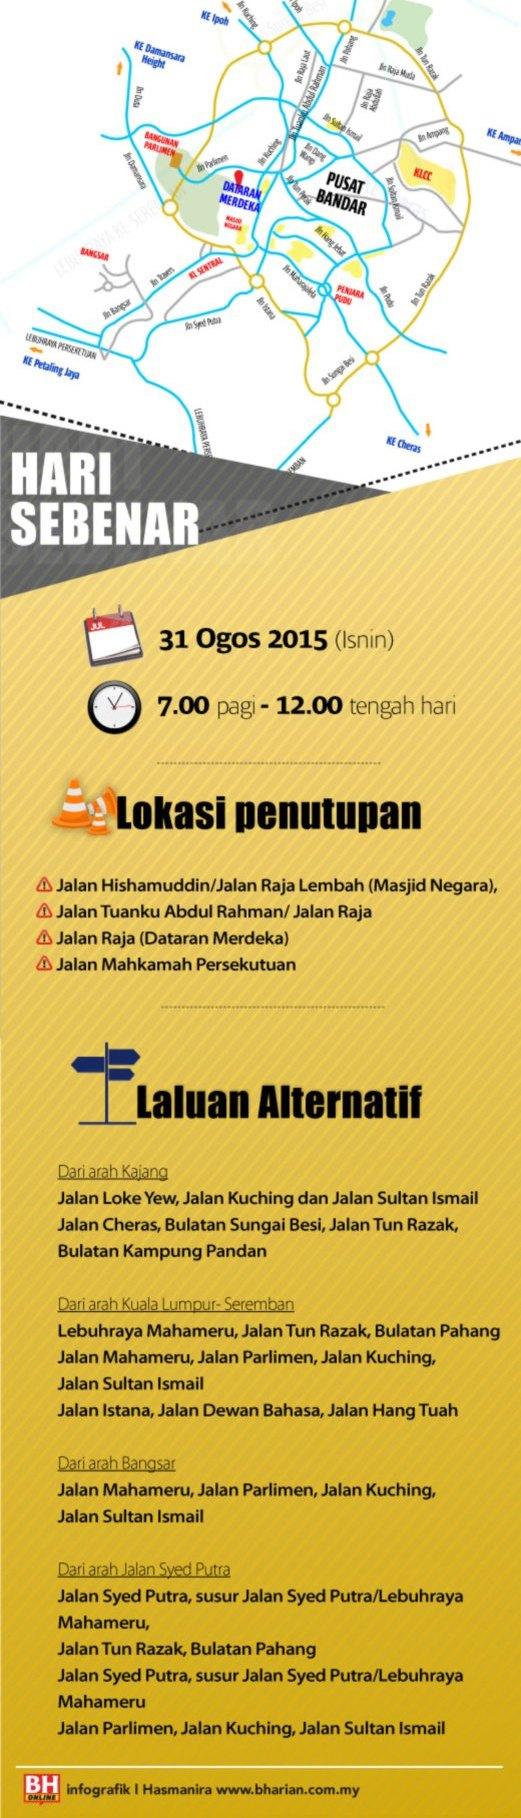 infografikjalan.jpg.transformed_02.jpg